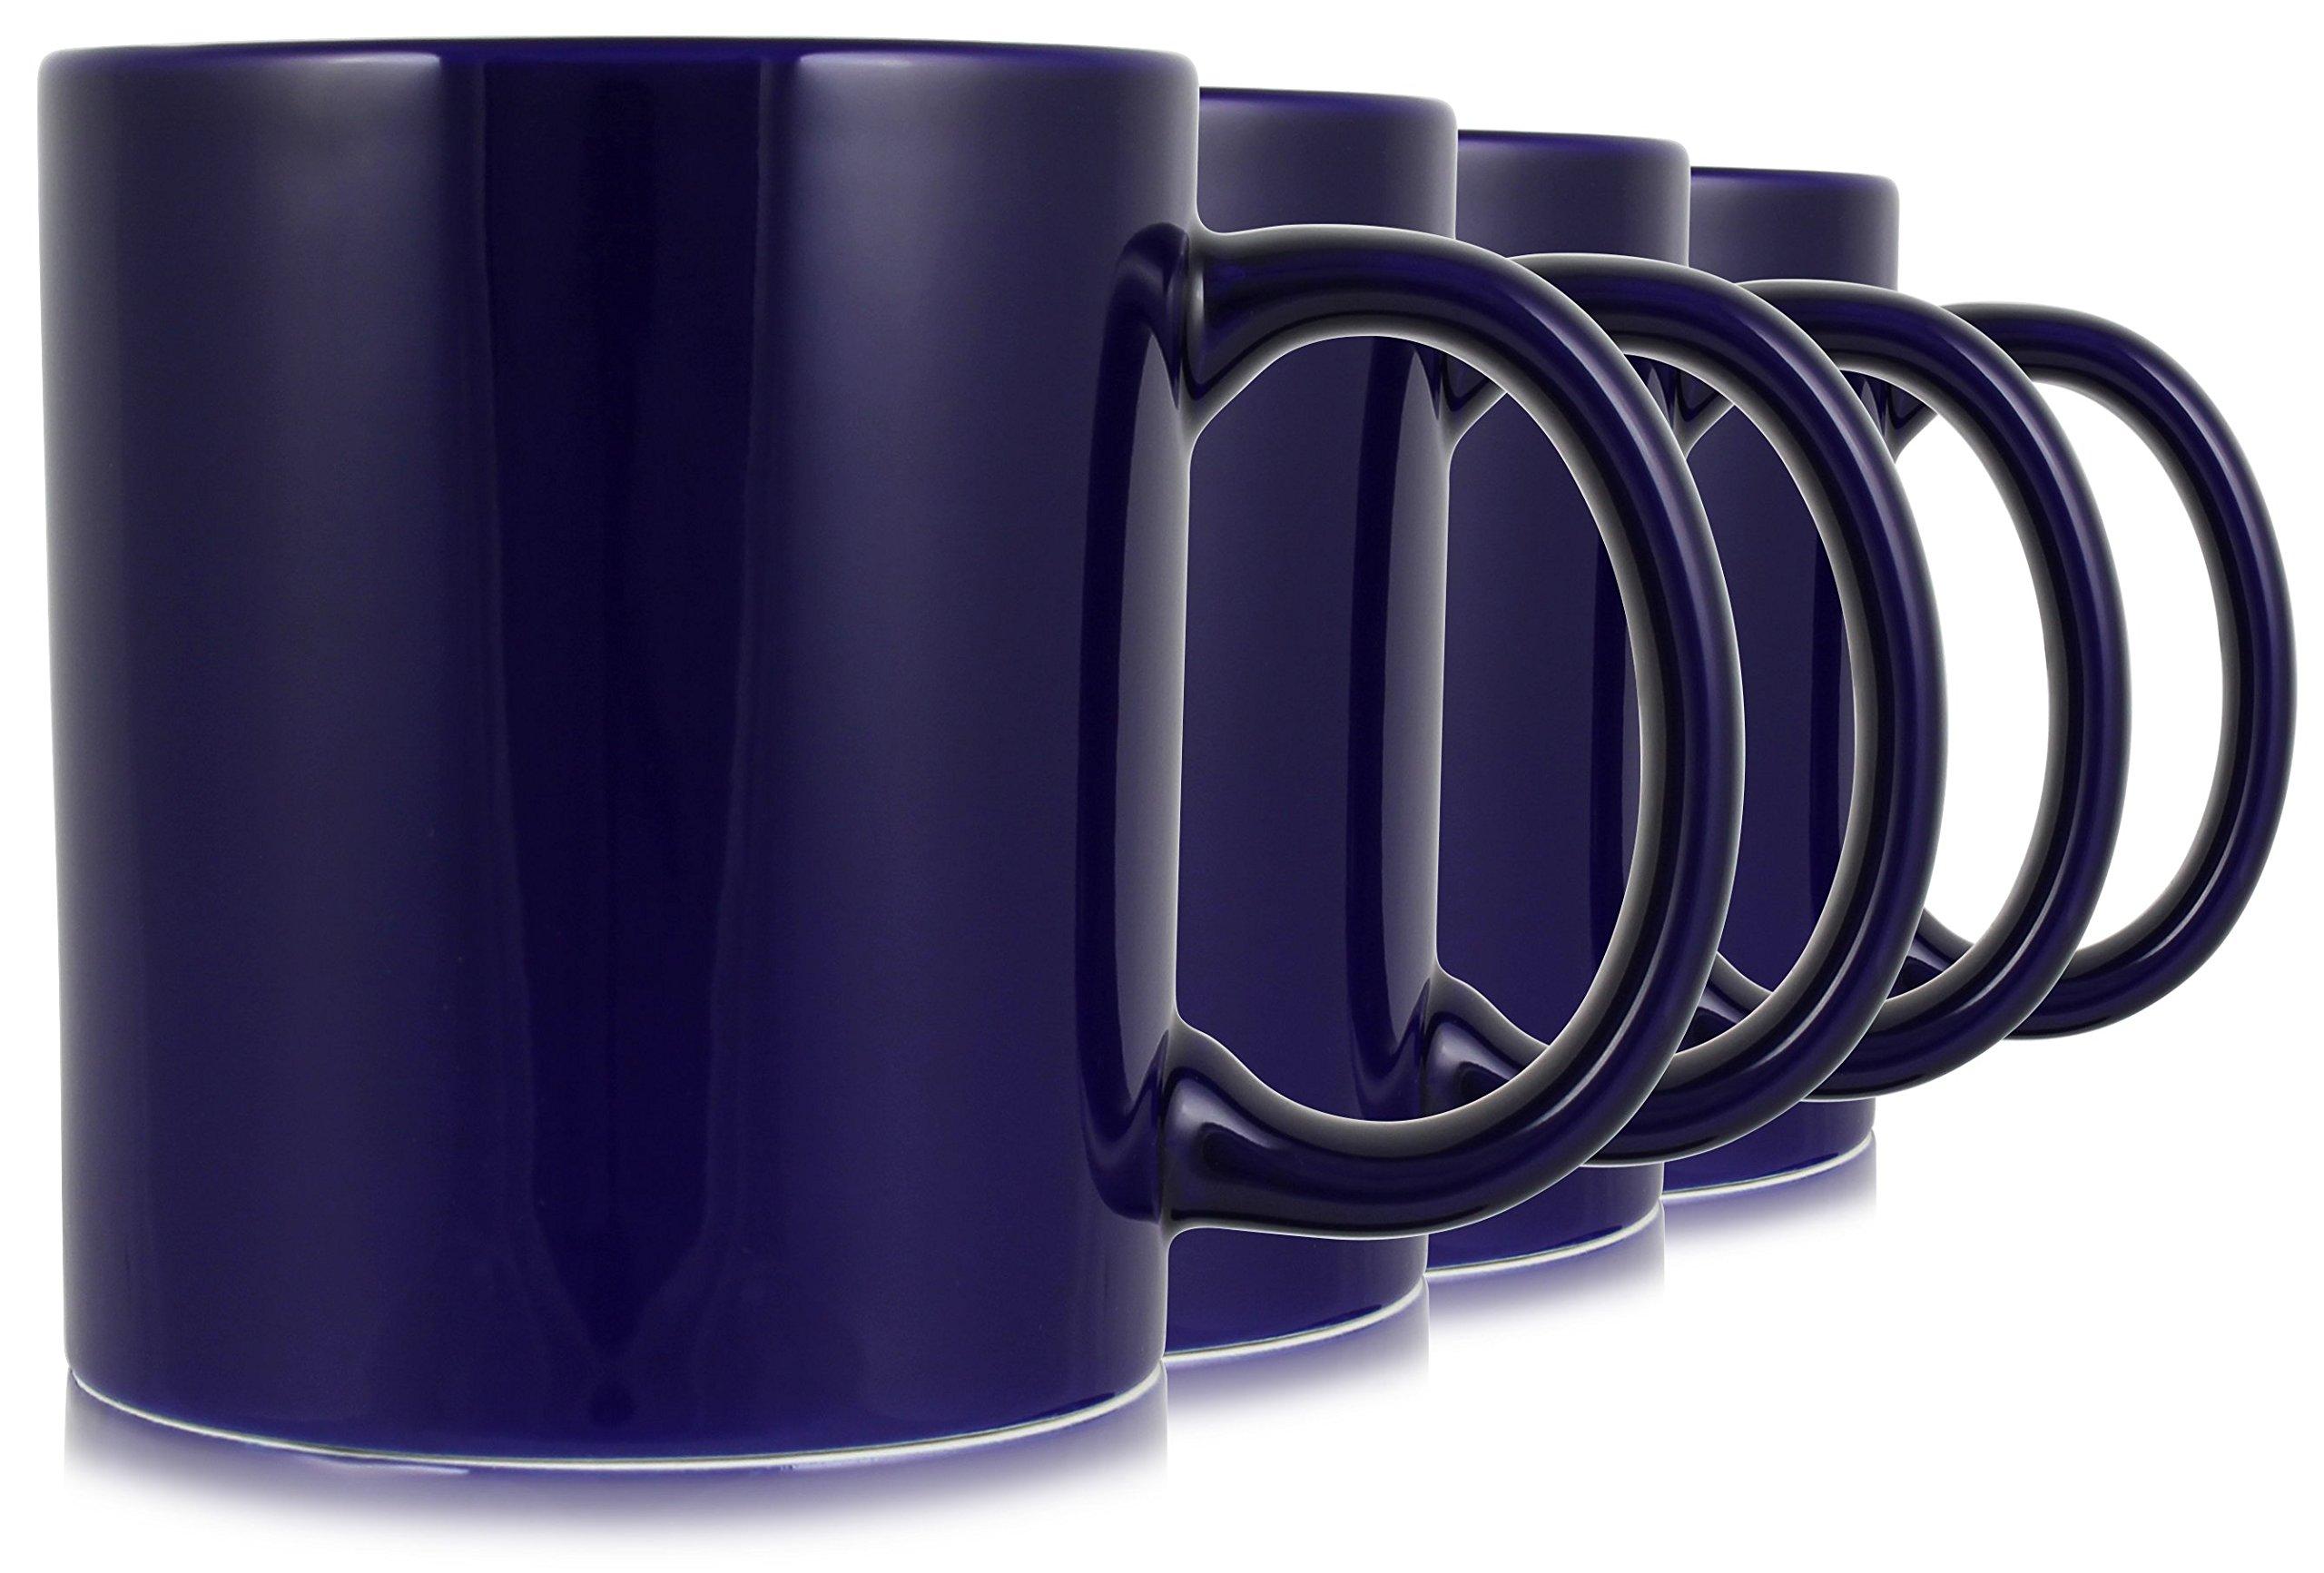 Serami 20oz Cobalt Large Classic Mugs for Coffee or Tea. Large Handle and Ceramic Construction, Set of 4